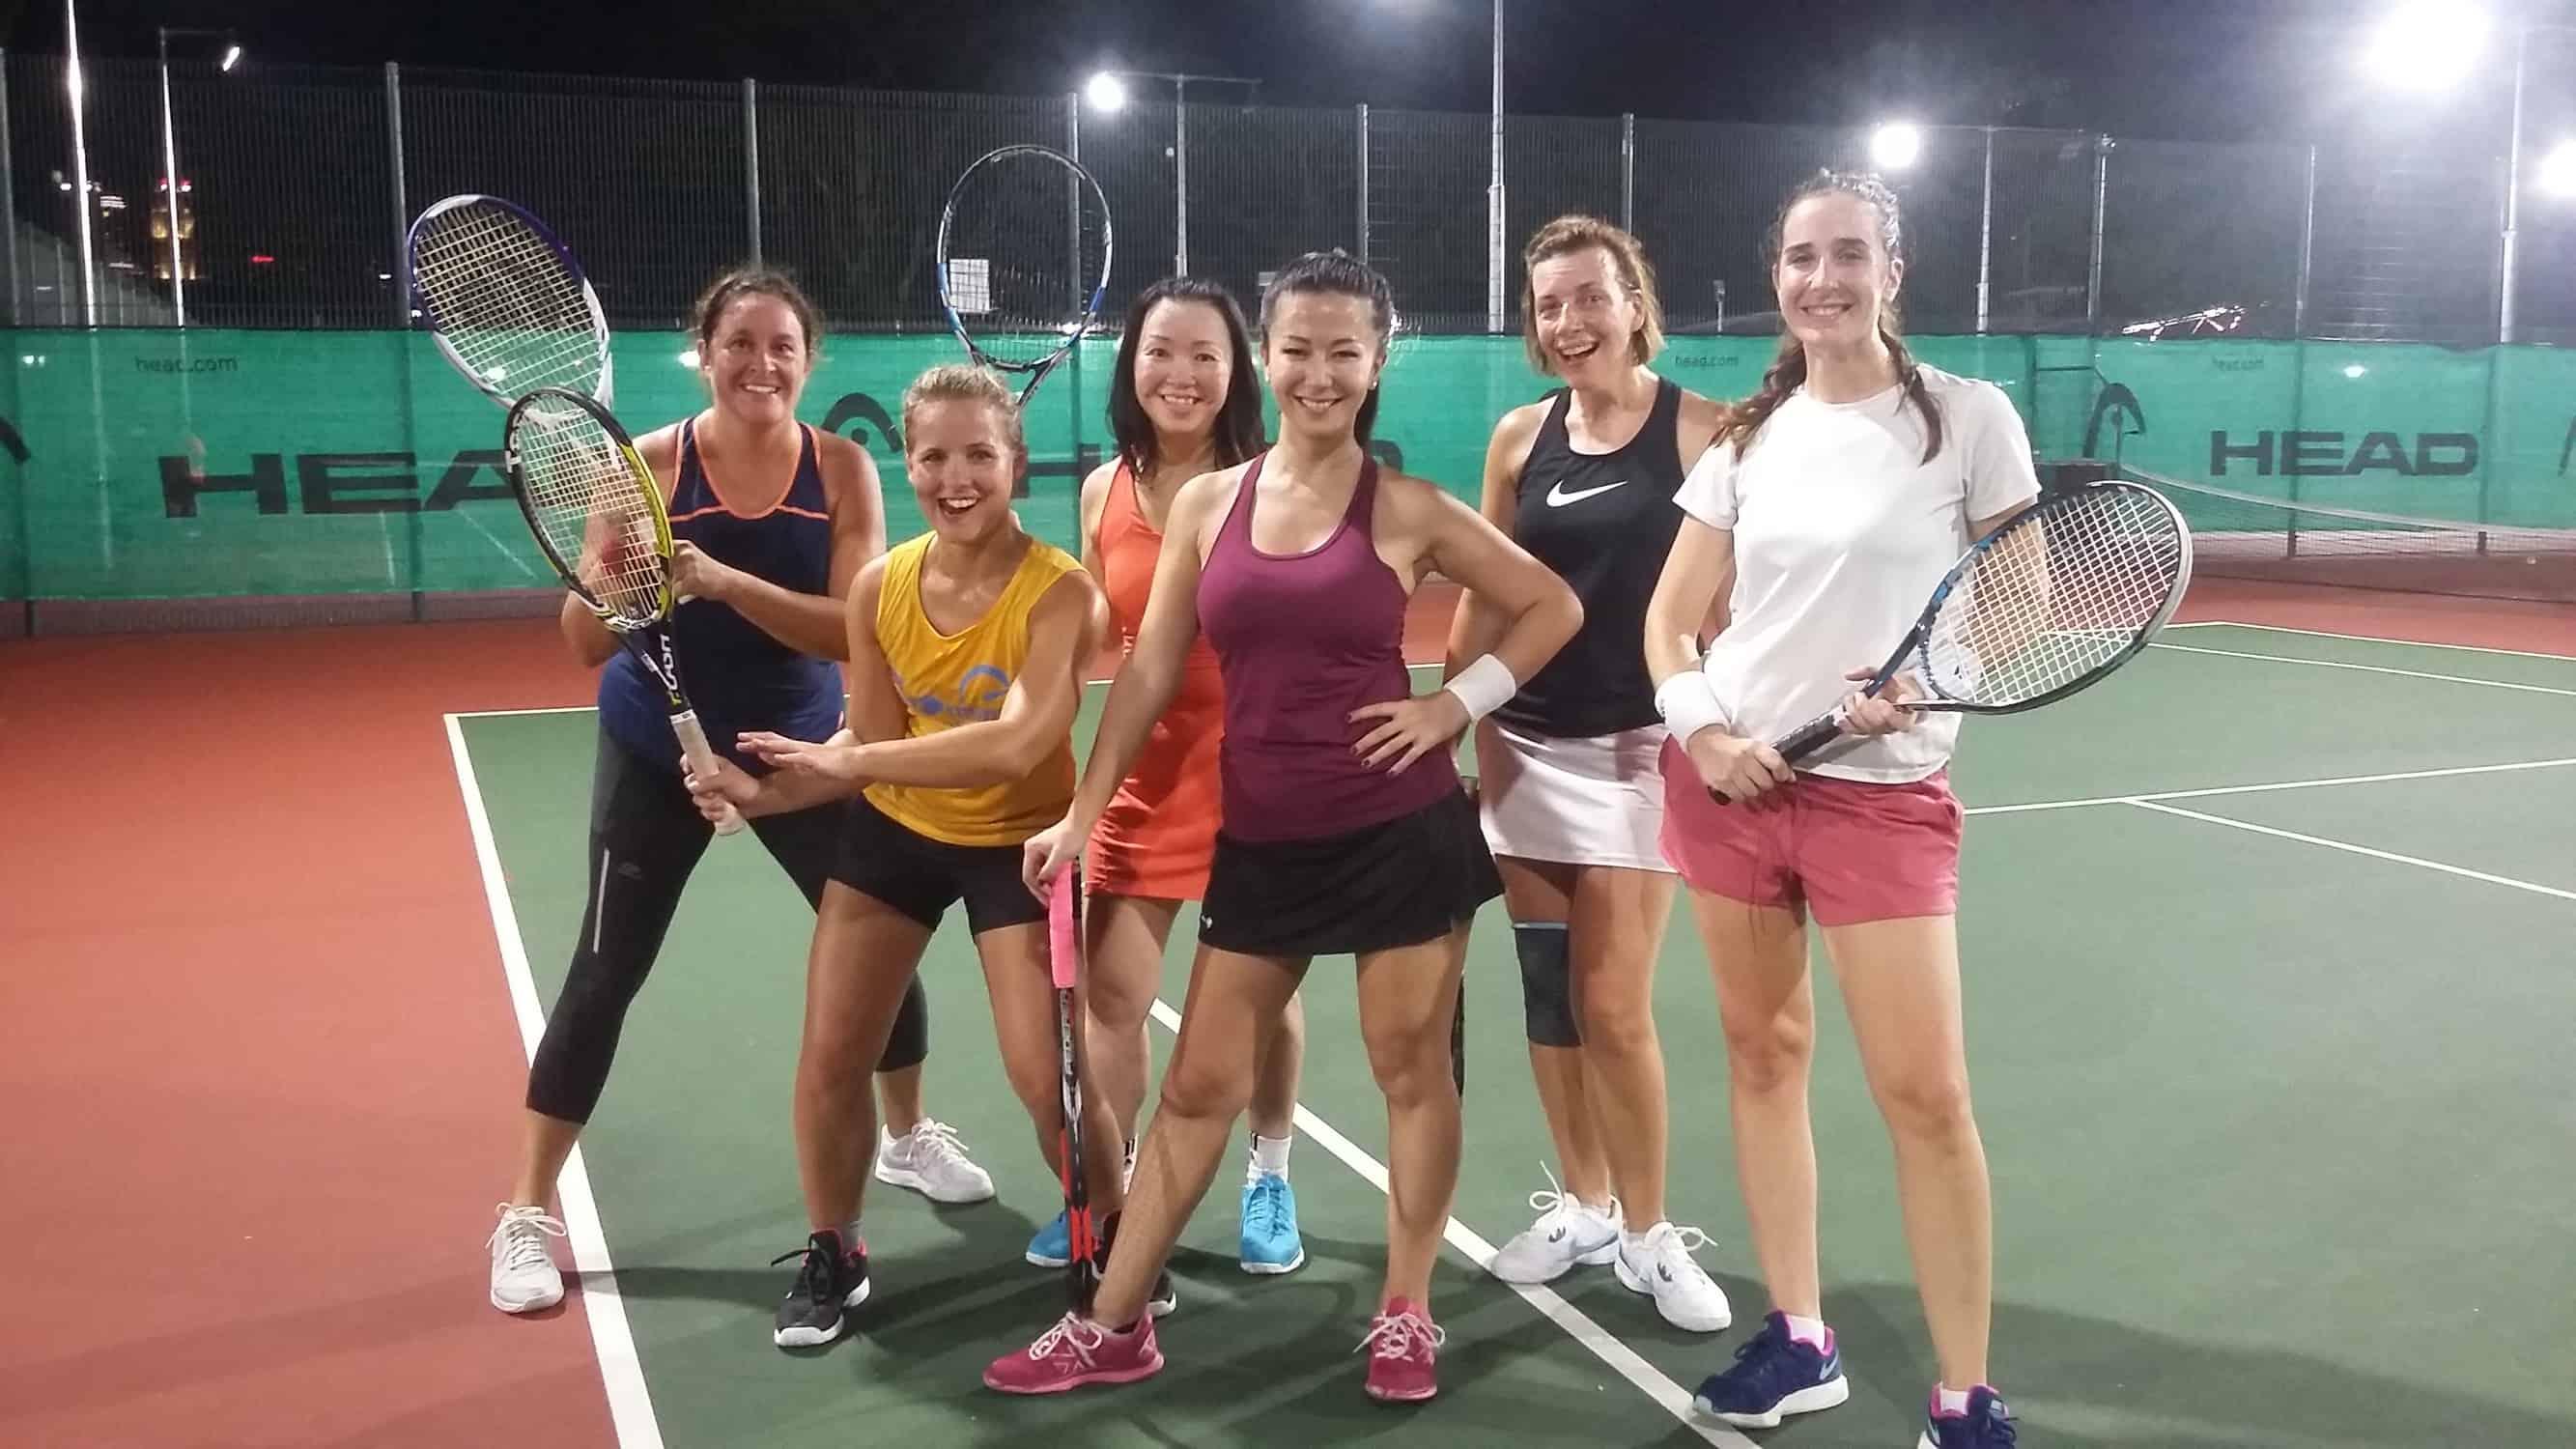 image-B TENNIS: Club de tennis